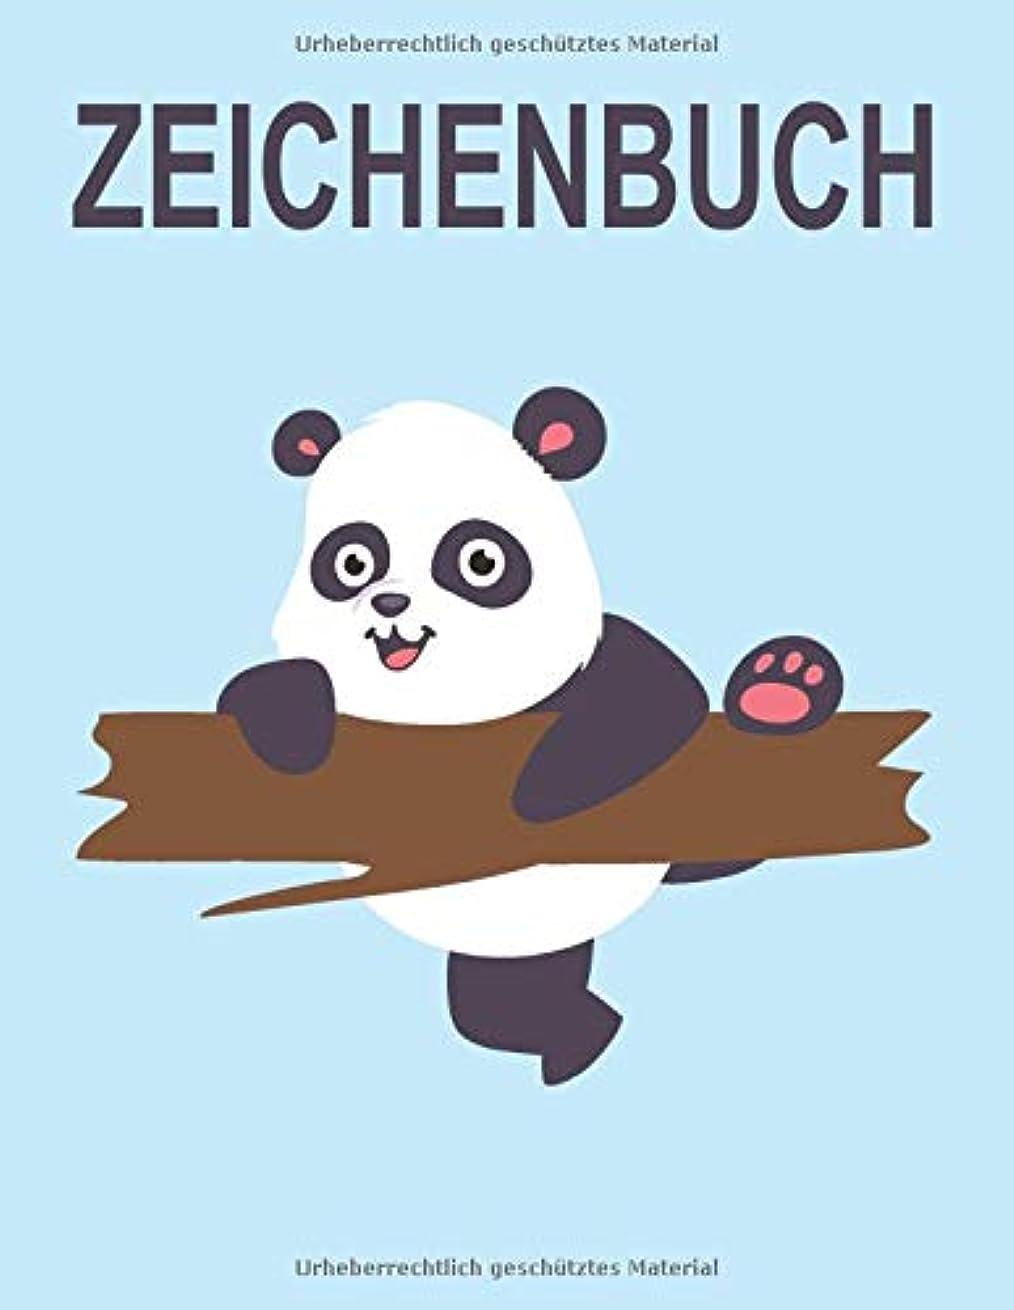 通り樹木経験者Zeichenbuch: Zeichen- und Skizzenbuch im grosszuegigen A4 Format fuer Kinder und Erwachsene; Motiv: Panda klettert